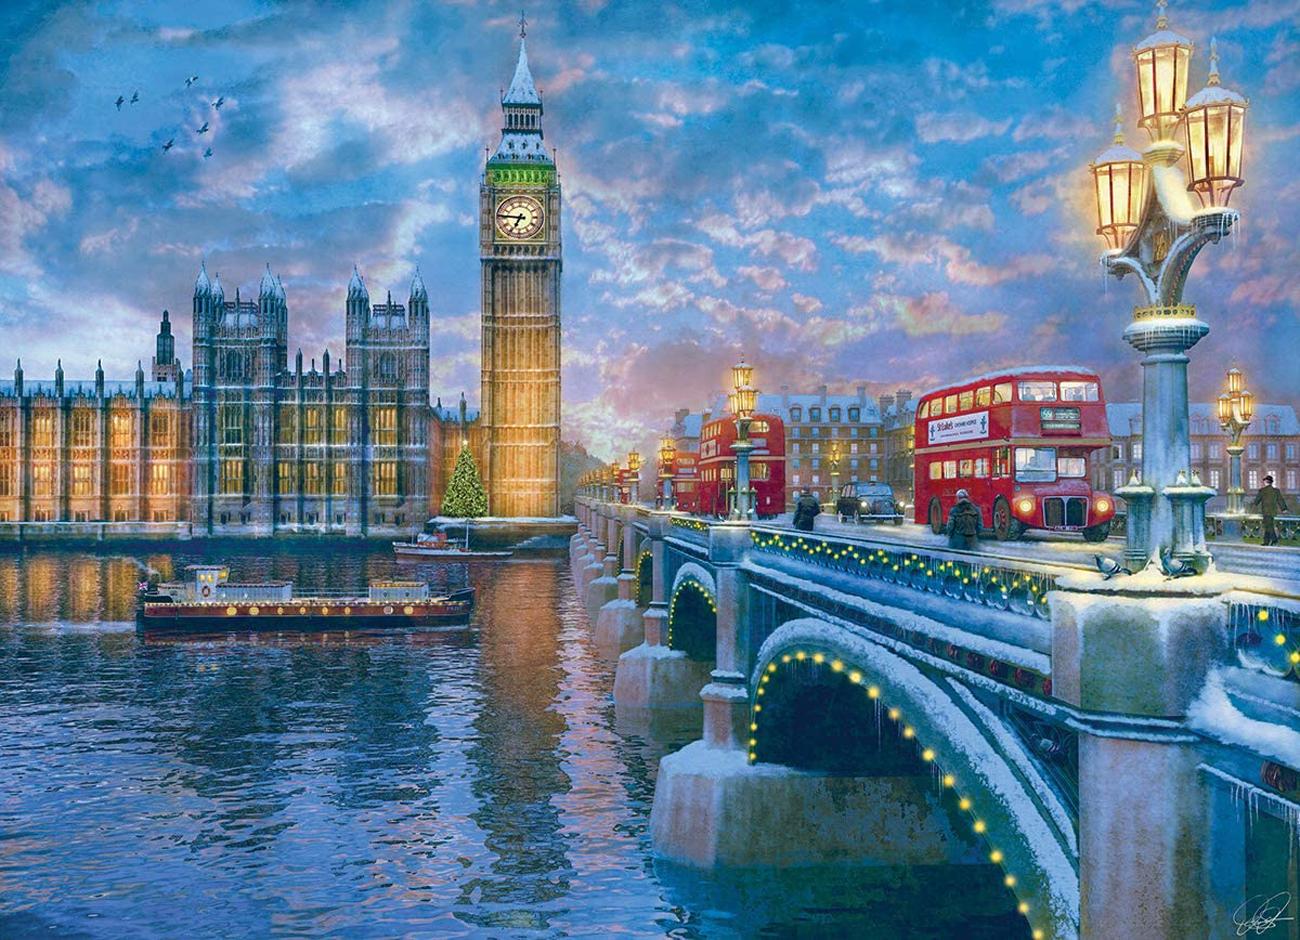 Christmas Eve in London Landmarks / Monuments Jigsaw Puzzle